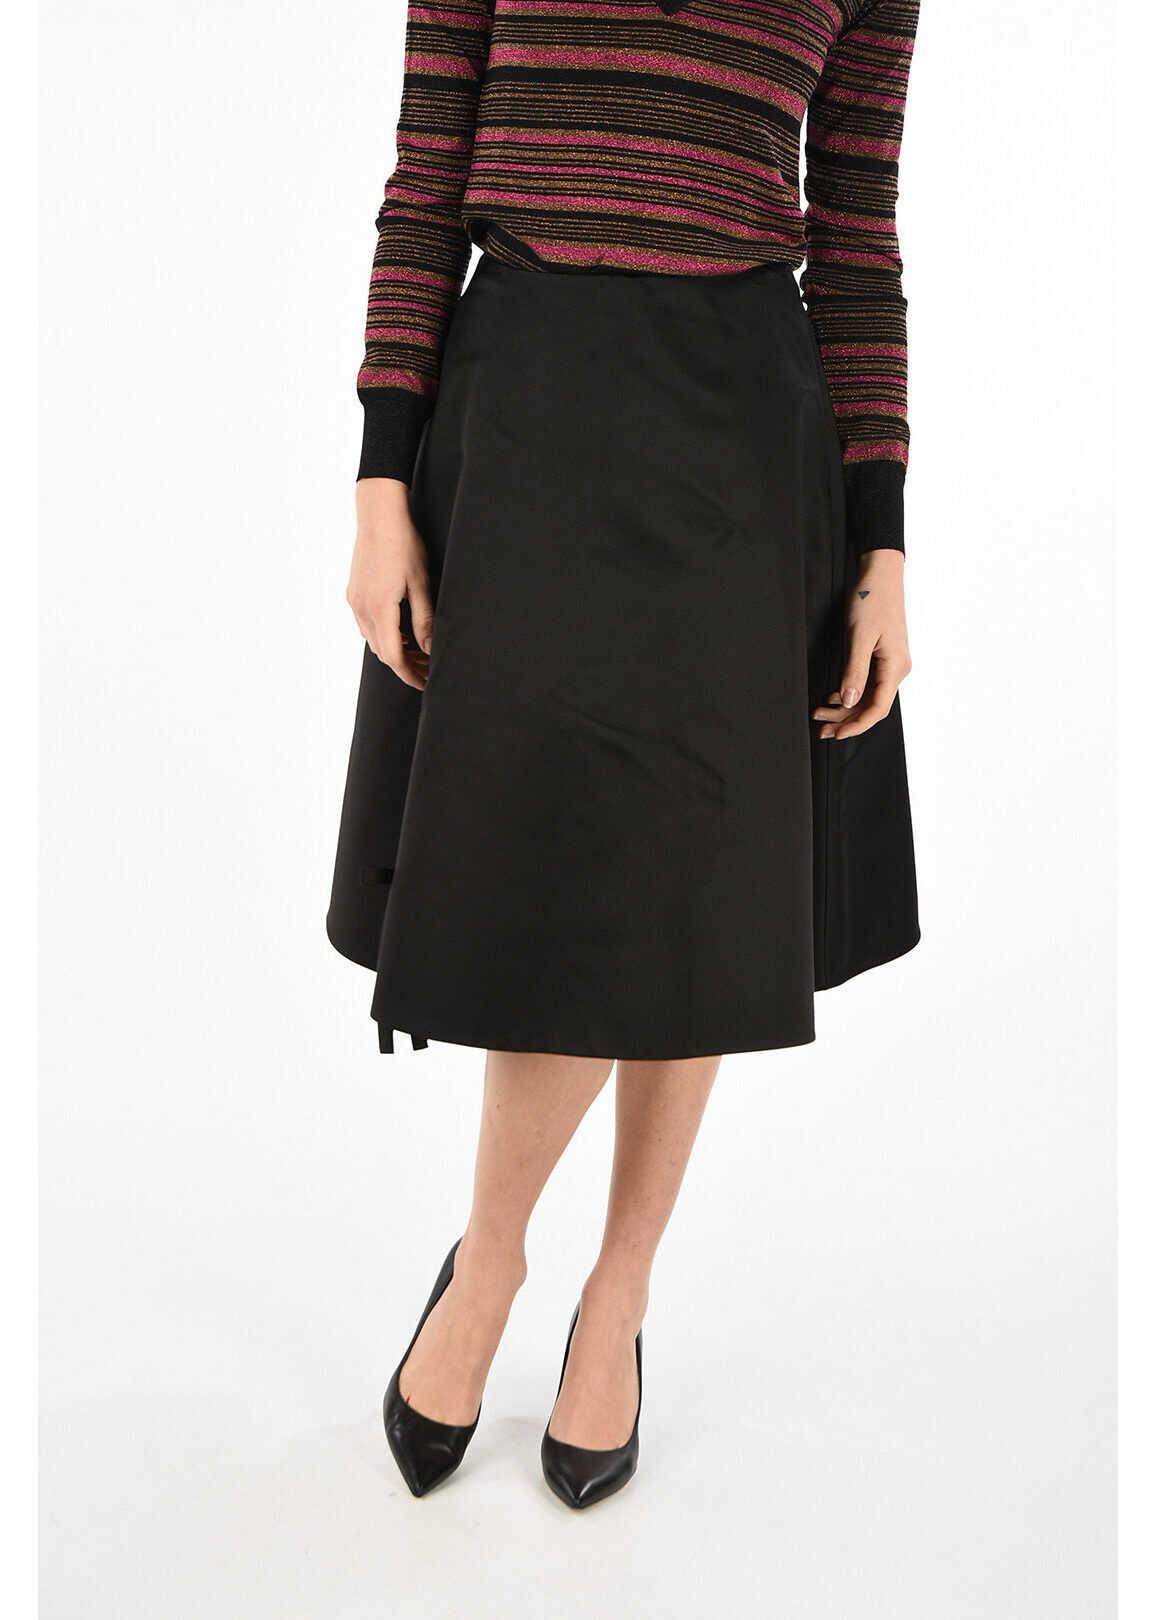 Prada silk skirt BLACK